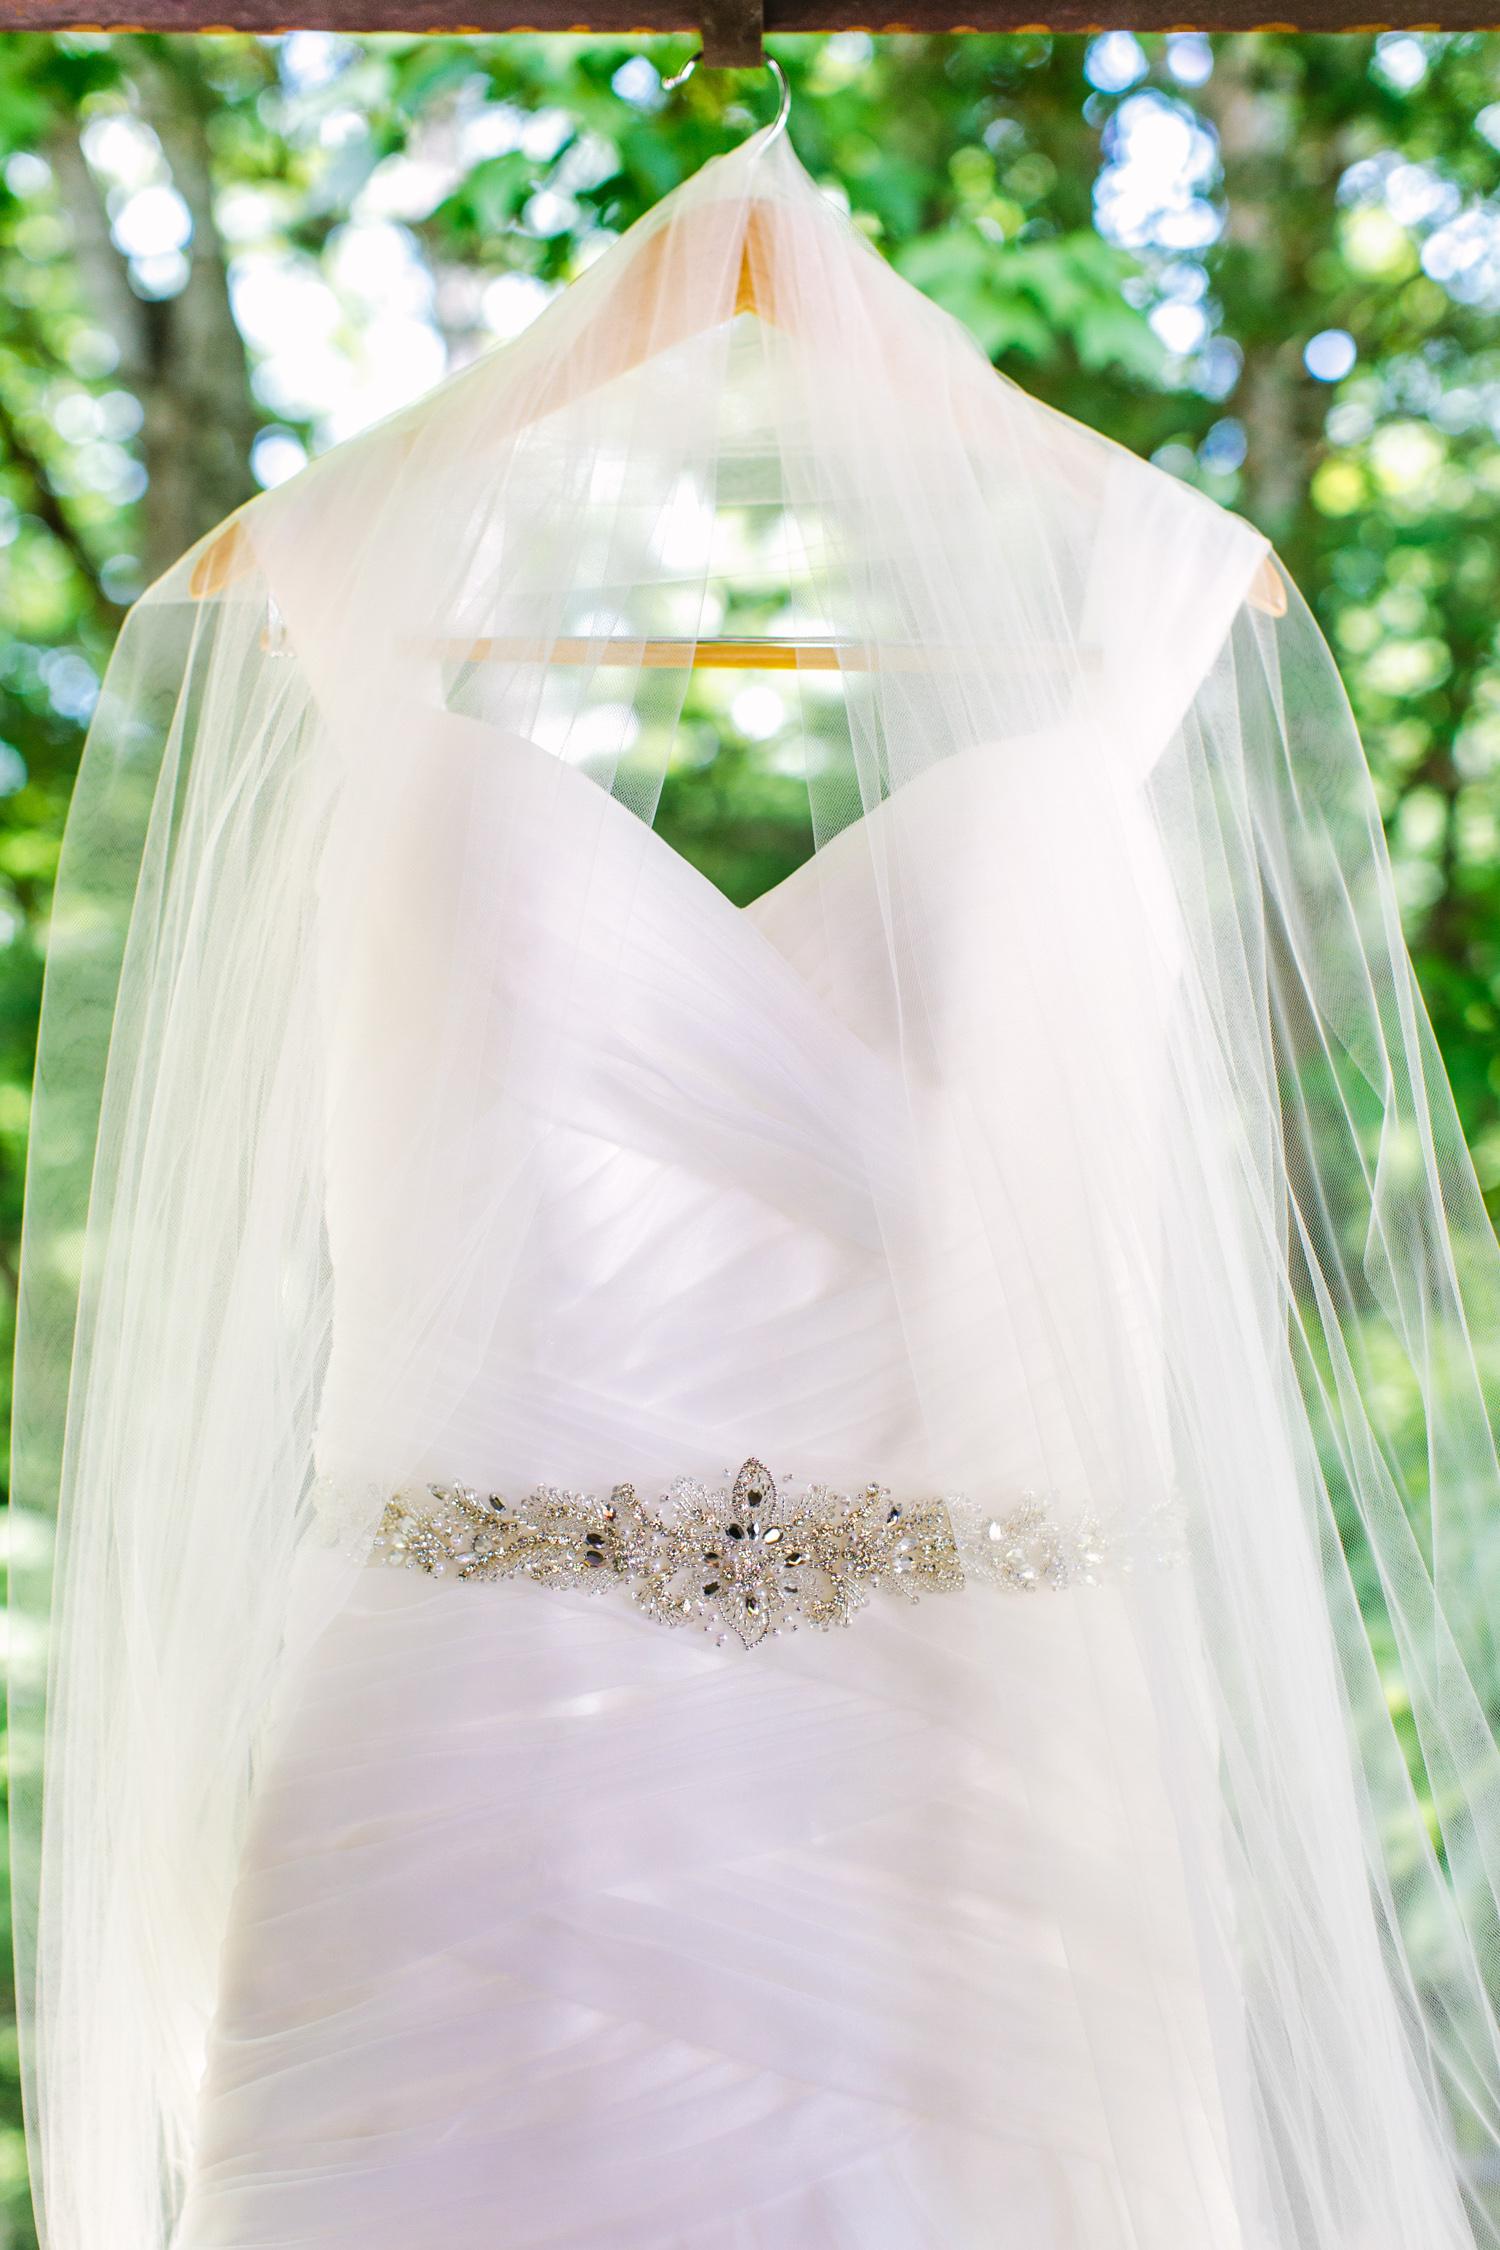 Knoxville Photographer Classic Outdoor Wedding Dress Veil